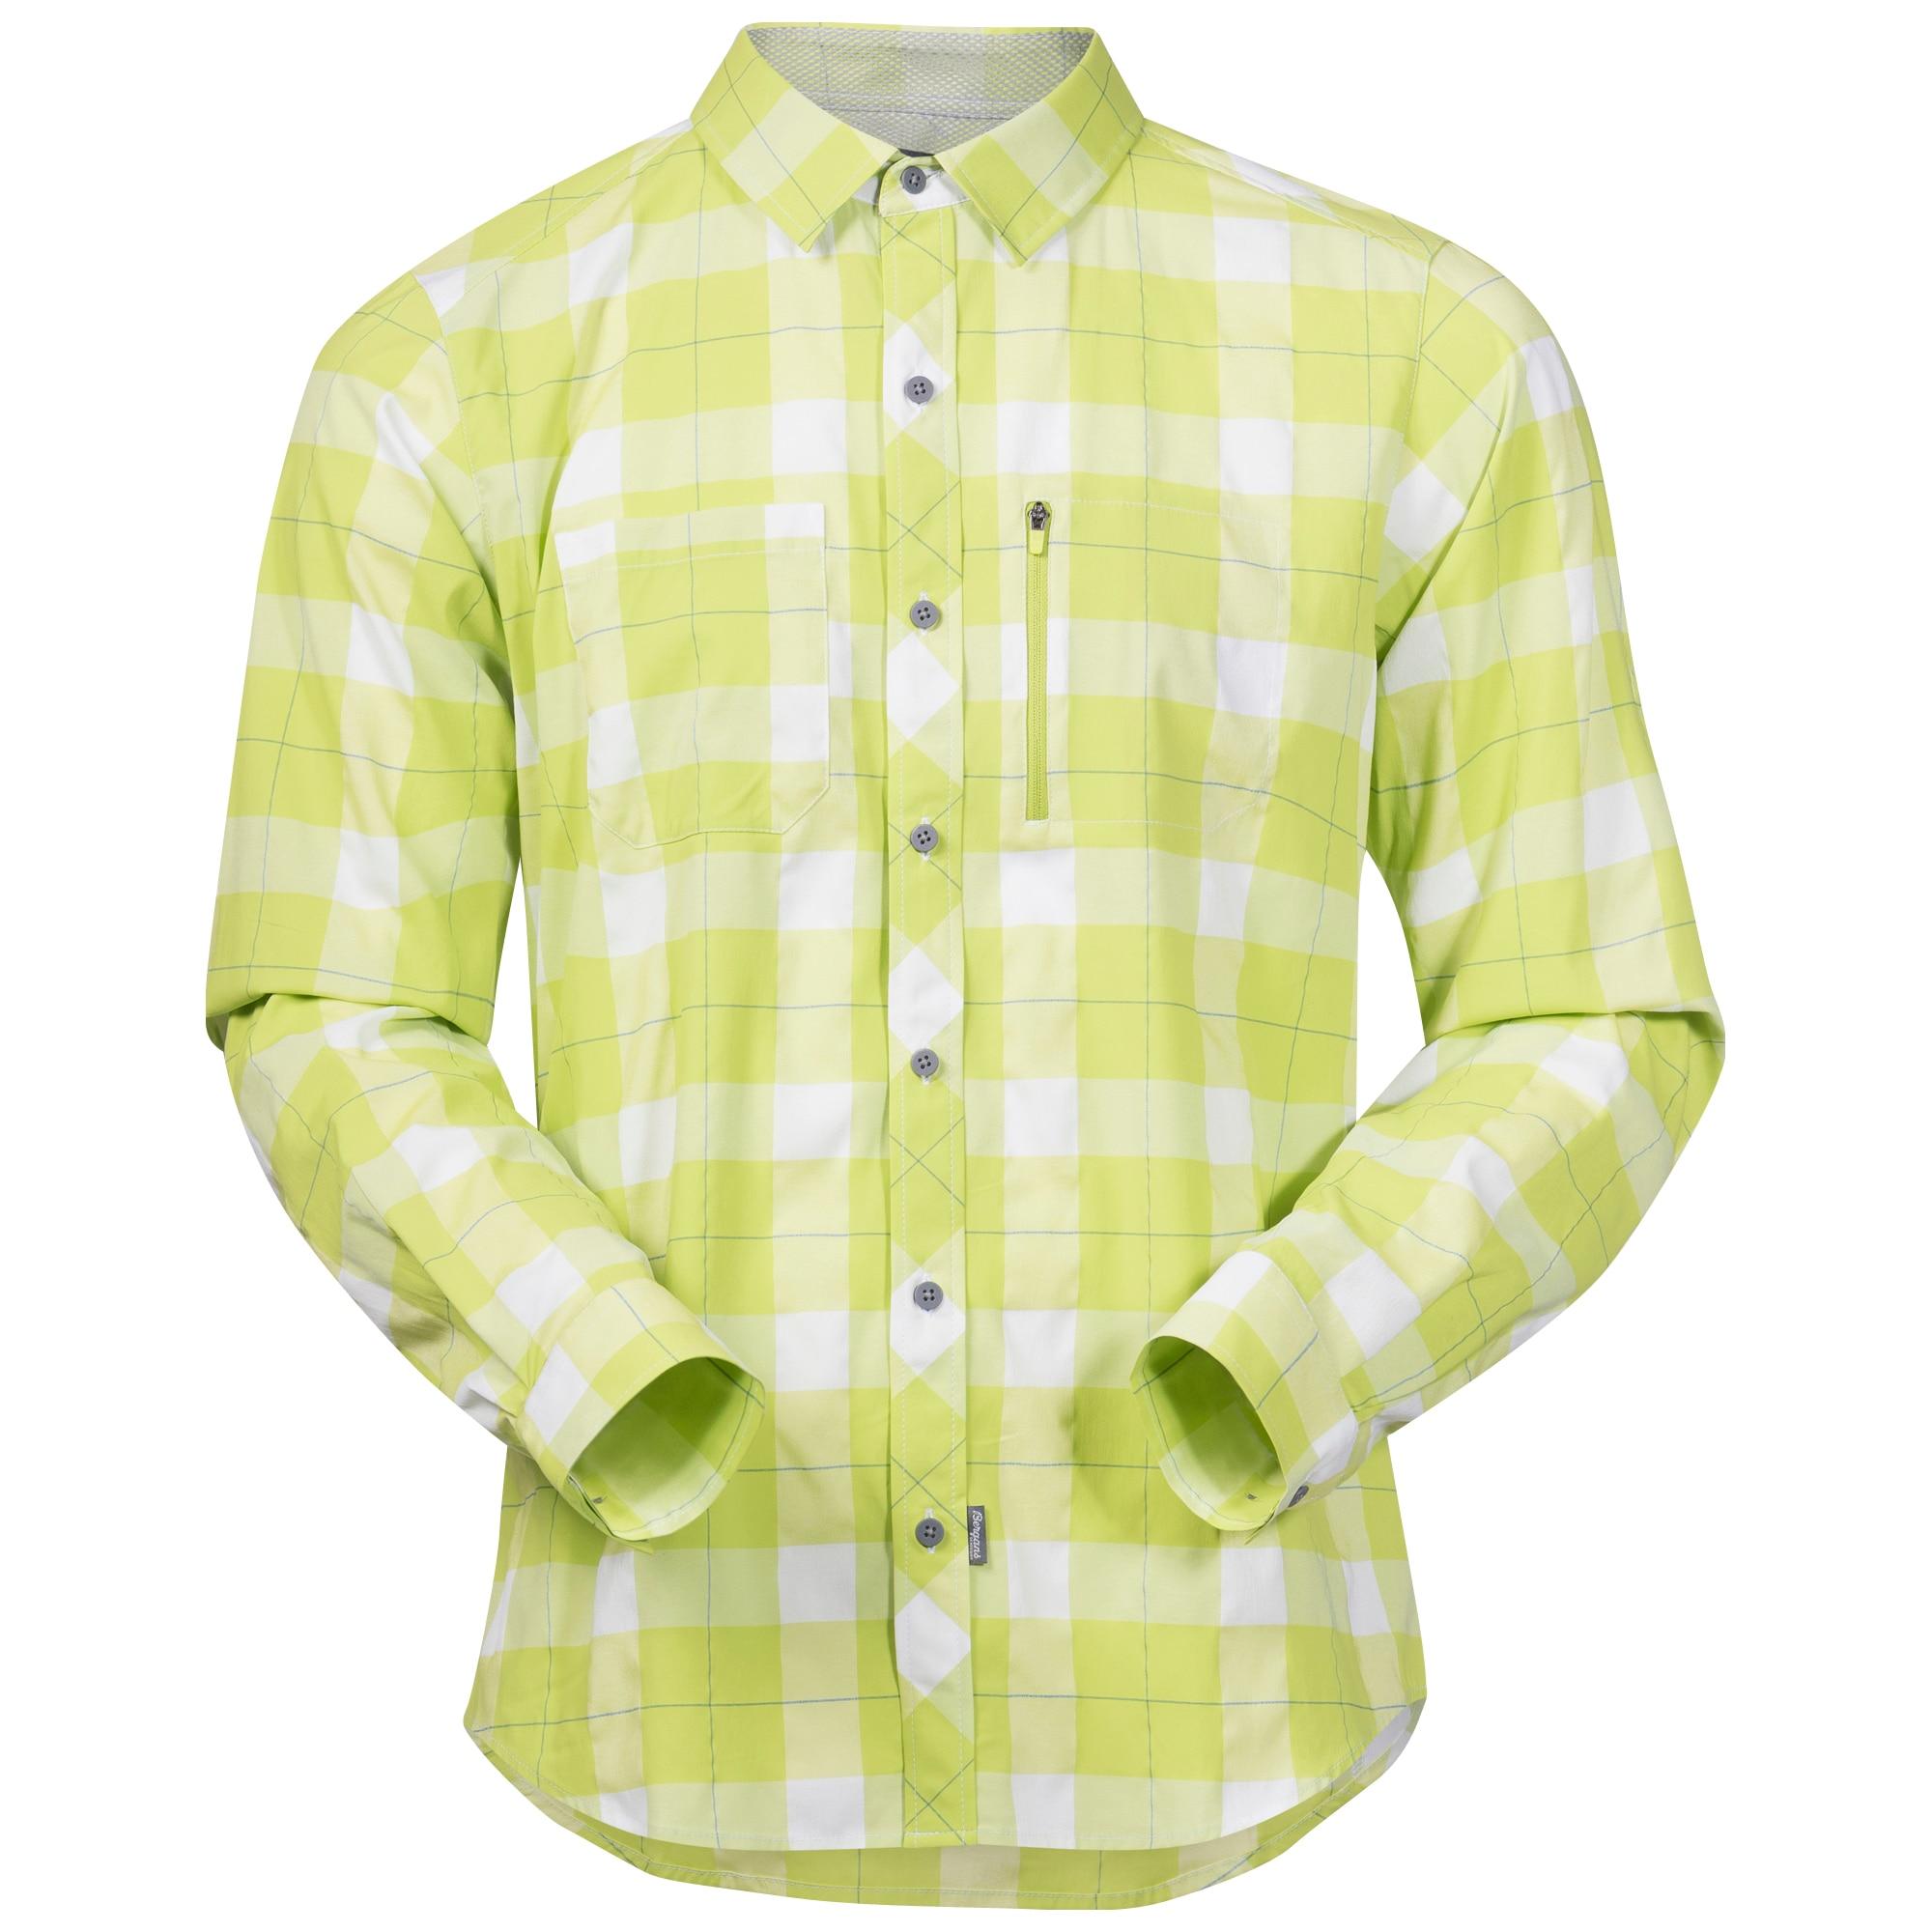 Jondal Shirt Long Sleeve